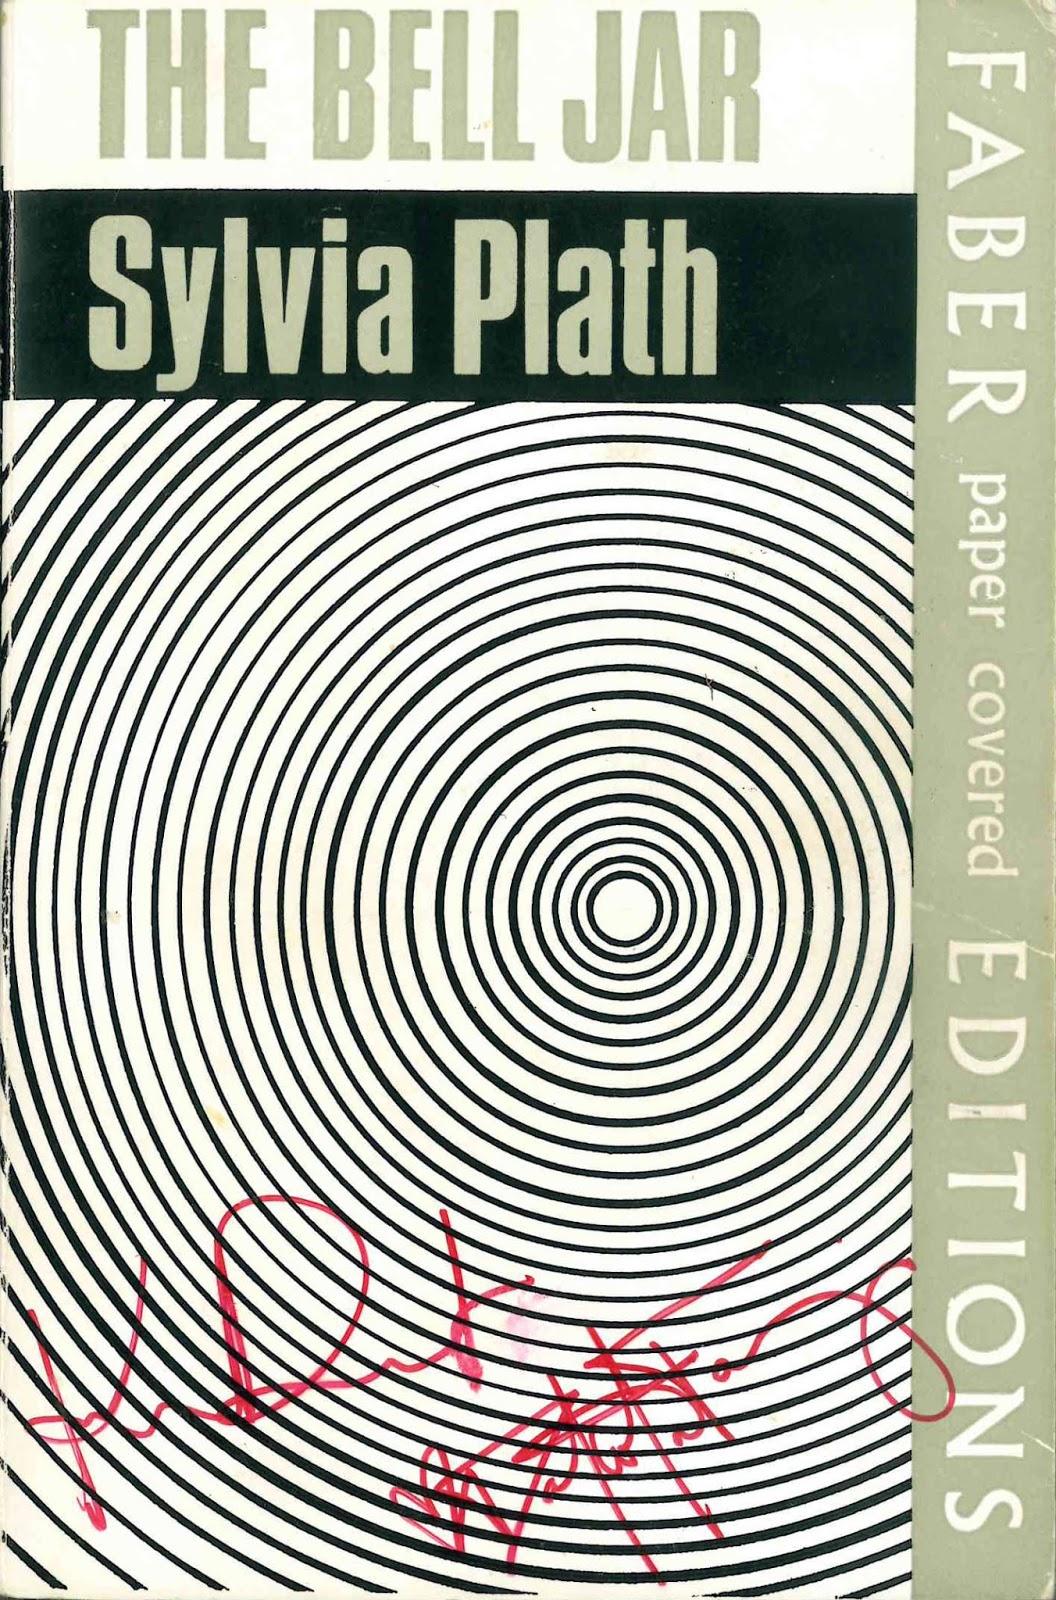 sylvia plath info a sylvia plath tour sylvia plath the bell jar faber 1967